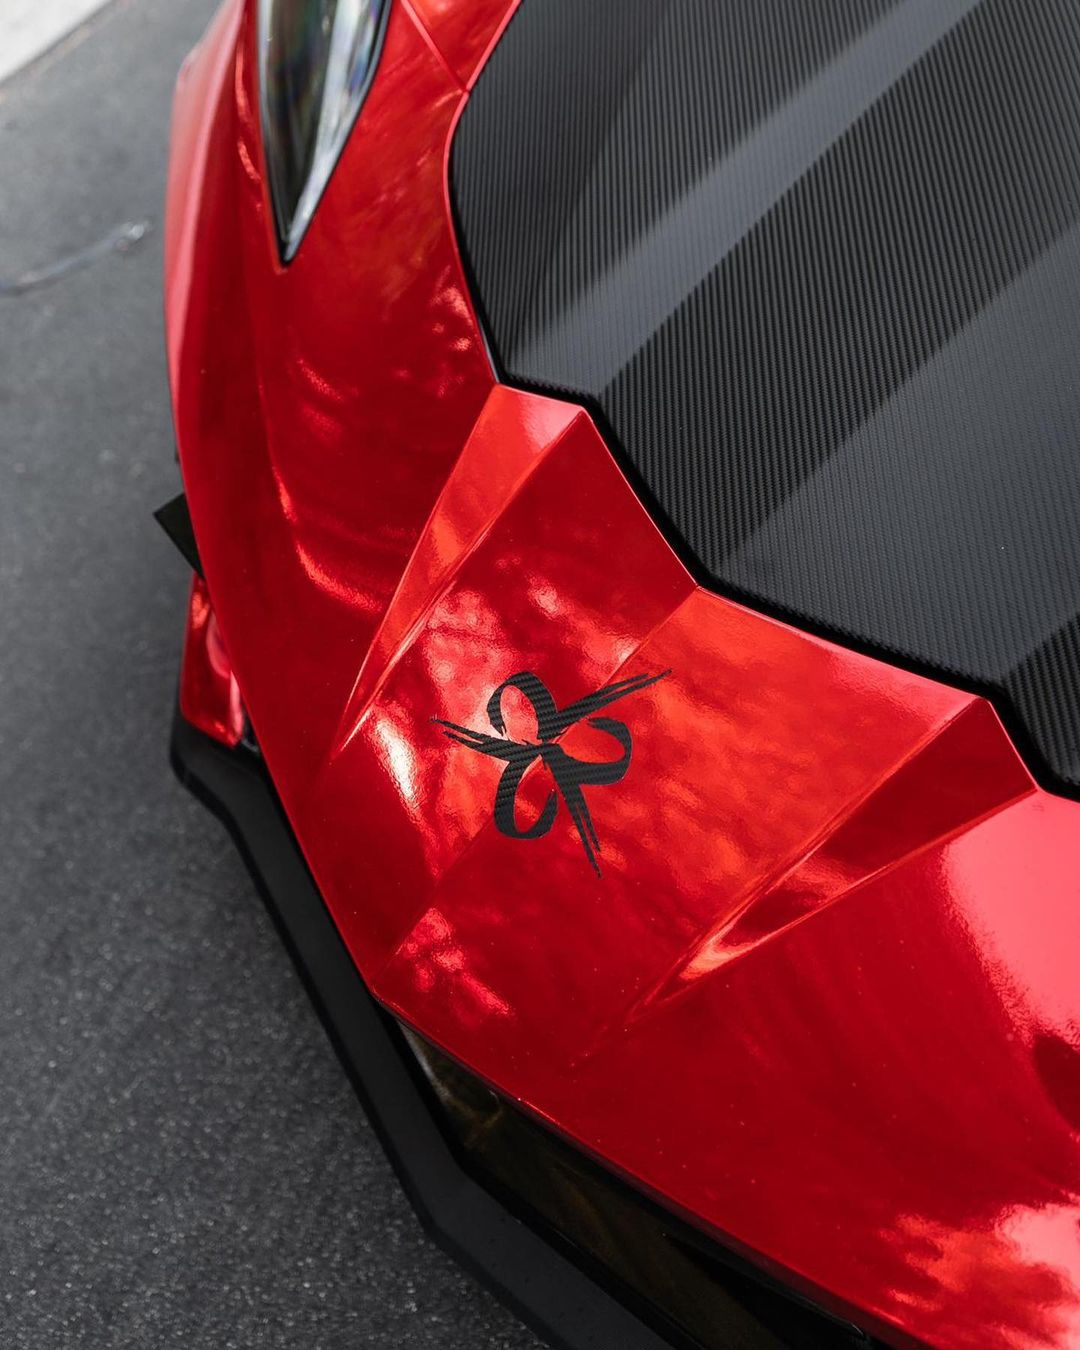 trippie redd corvette 1